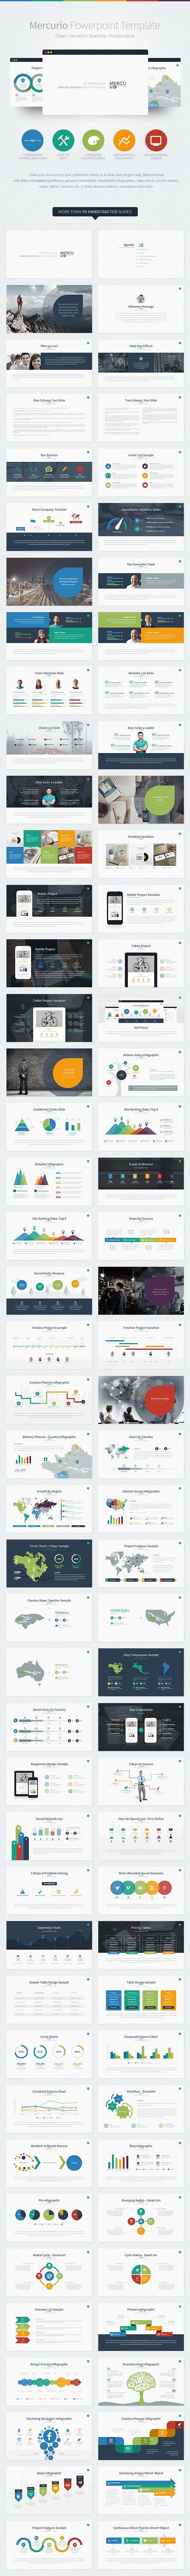 Mercurio PowerPoint Presentation Template